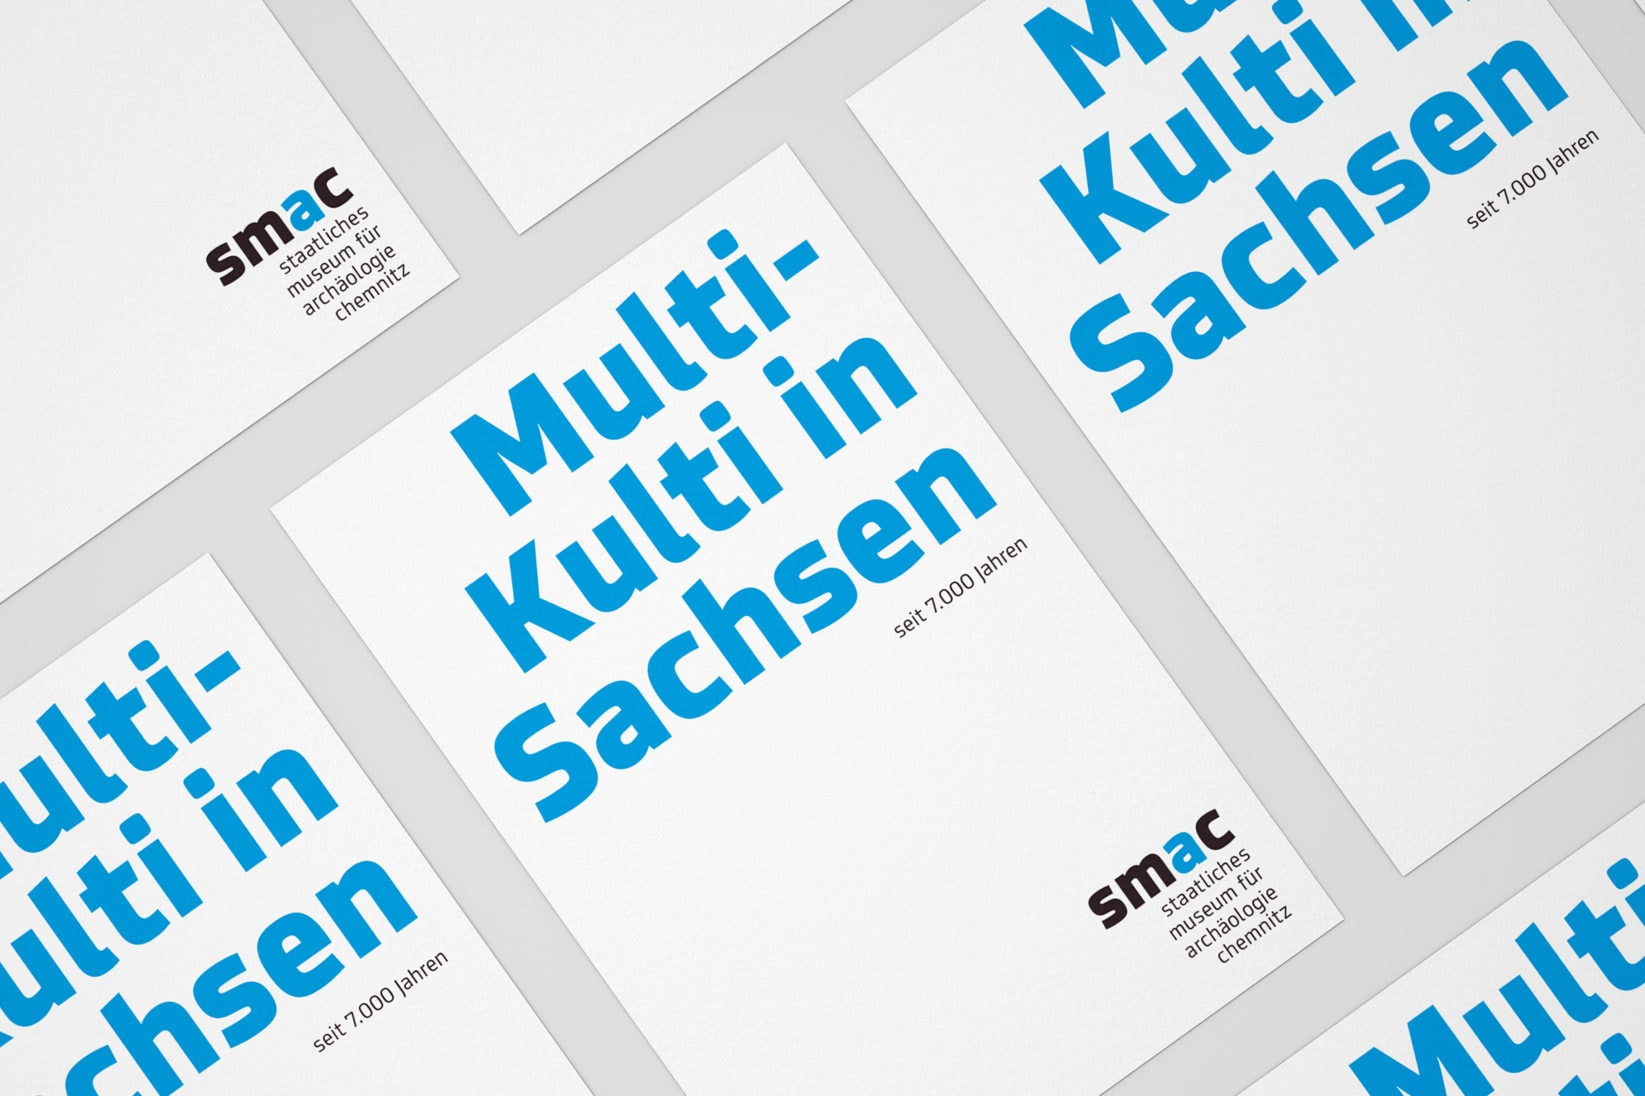 smac chemnitz corporate design postkarte multikulti bildmarke farben